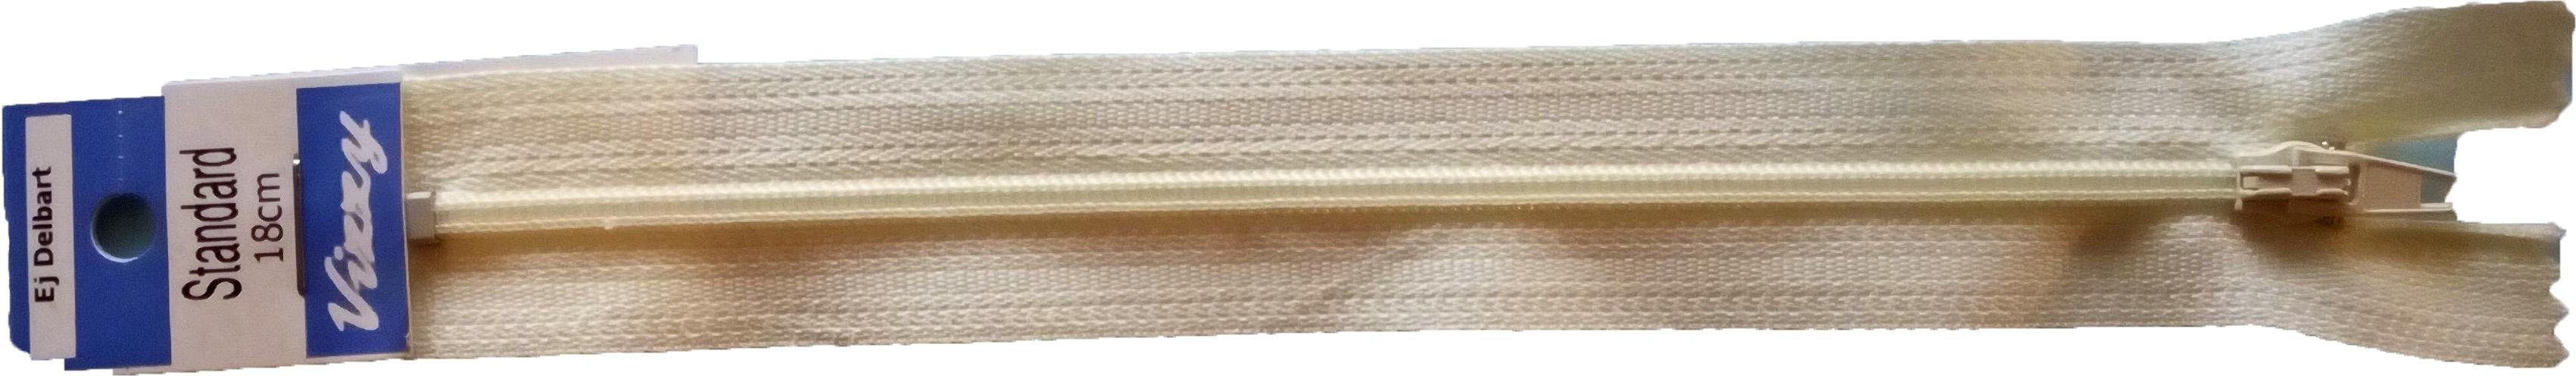 Blixtlås 18 mm Naturvit